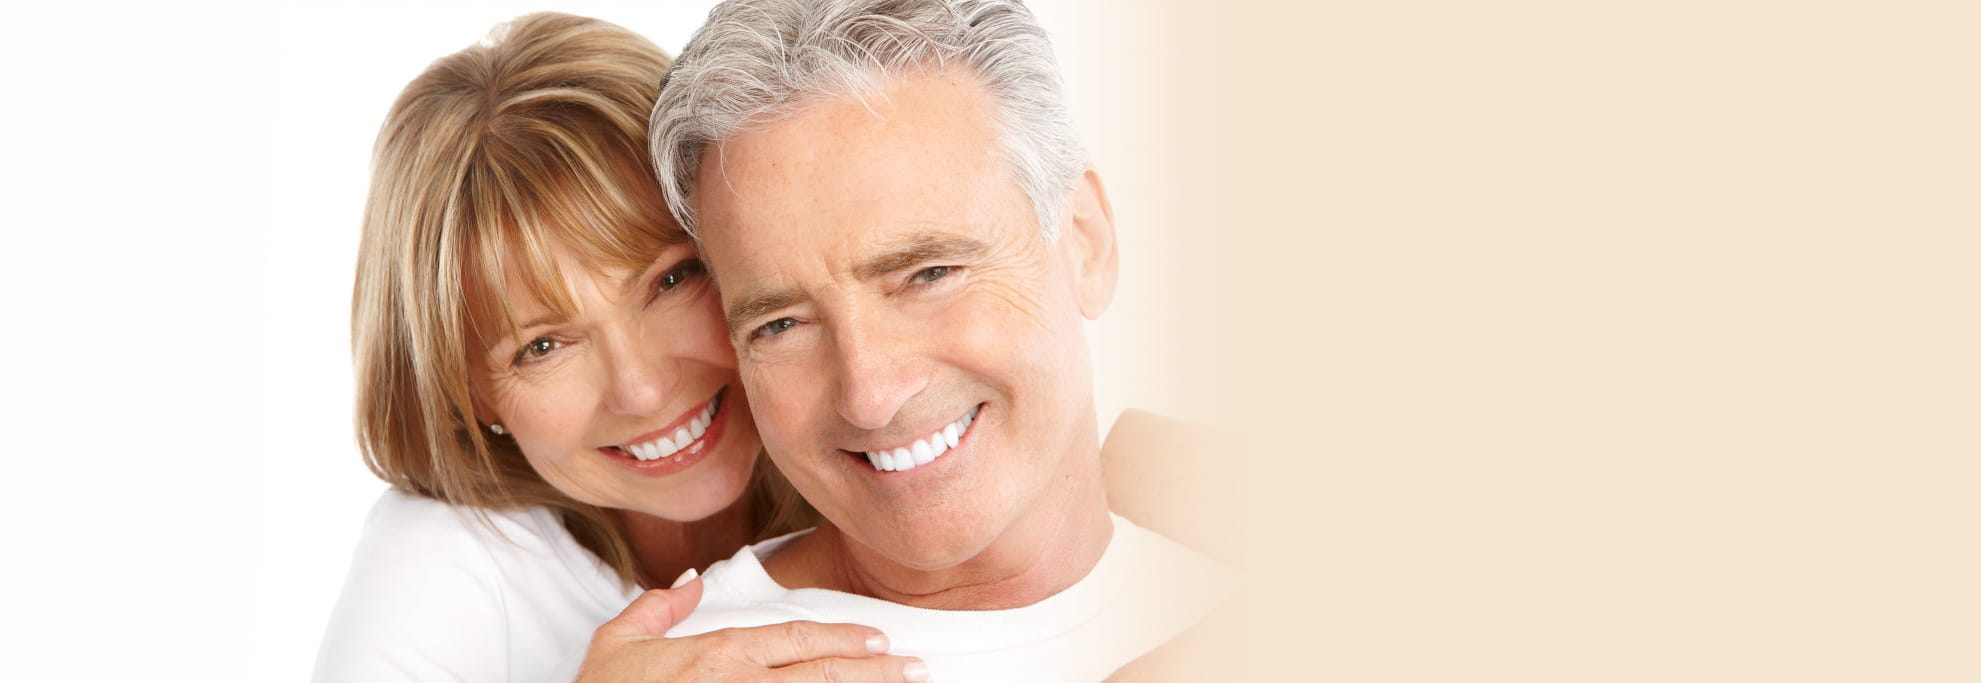 All-On-4<br/>Dental Implants